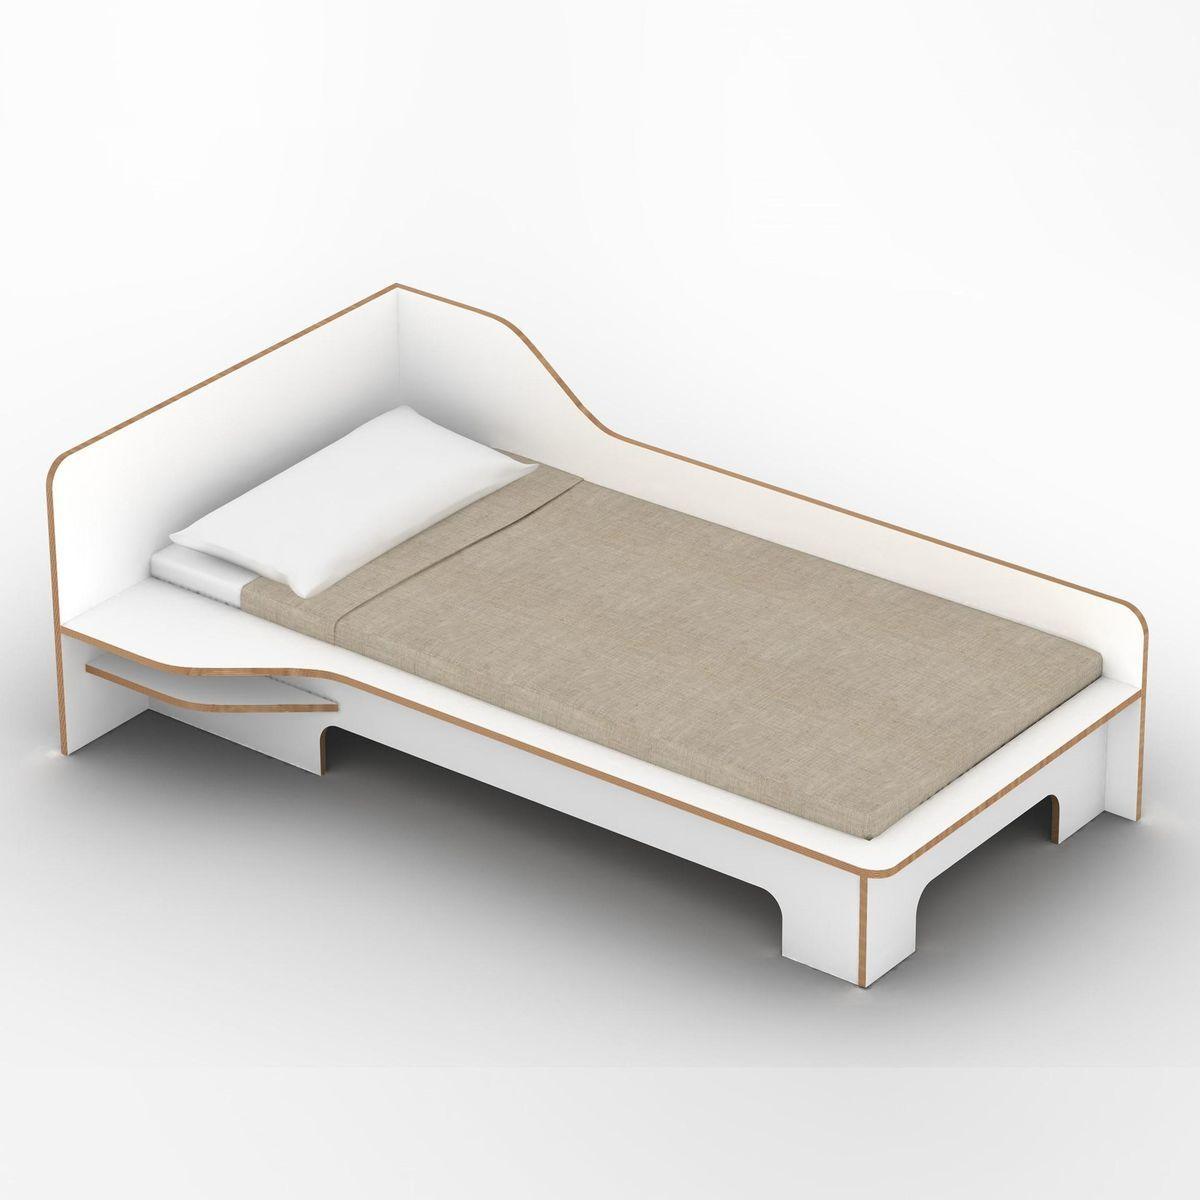 Bett ohne lattenrost welche matratze bett ohne lattenrost for Bett ohne lattenrost